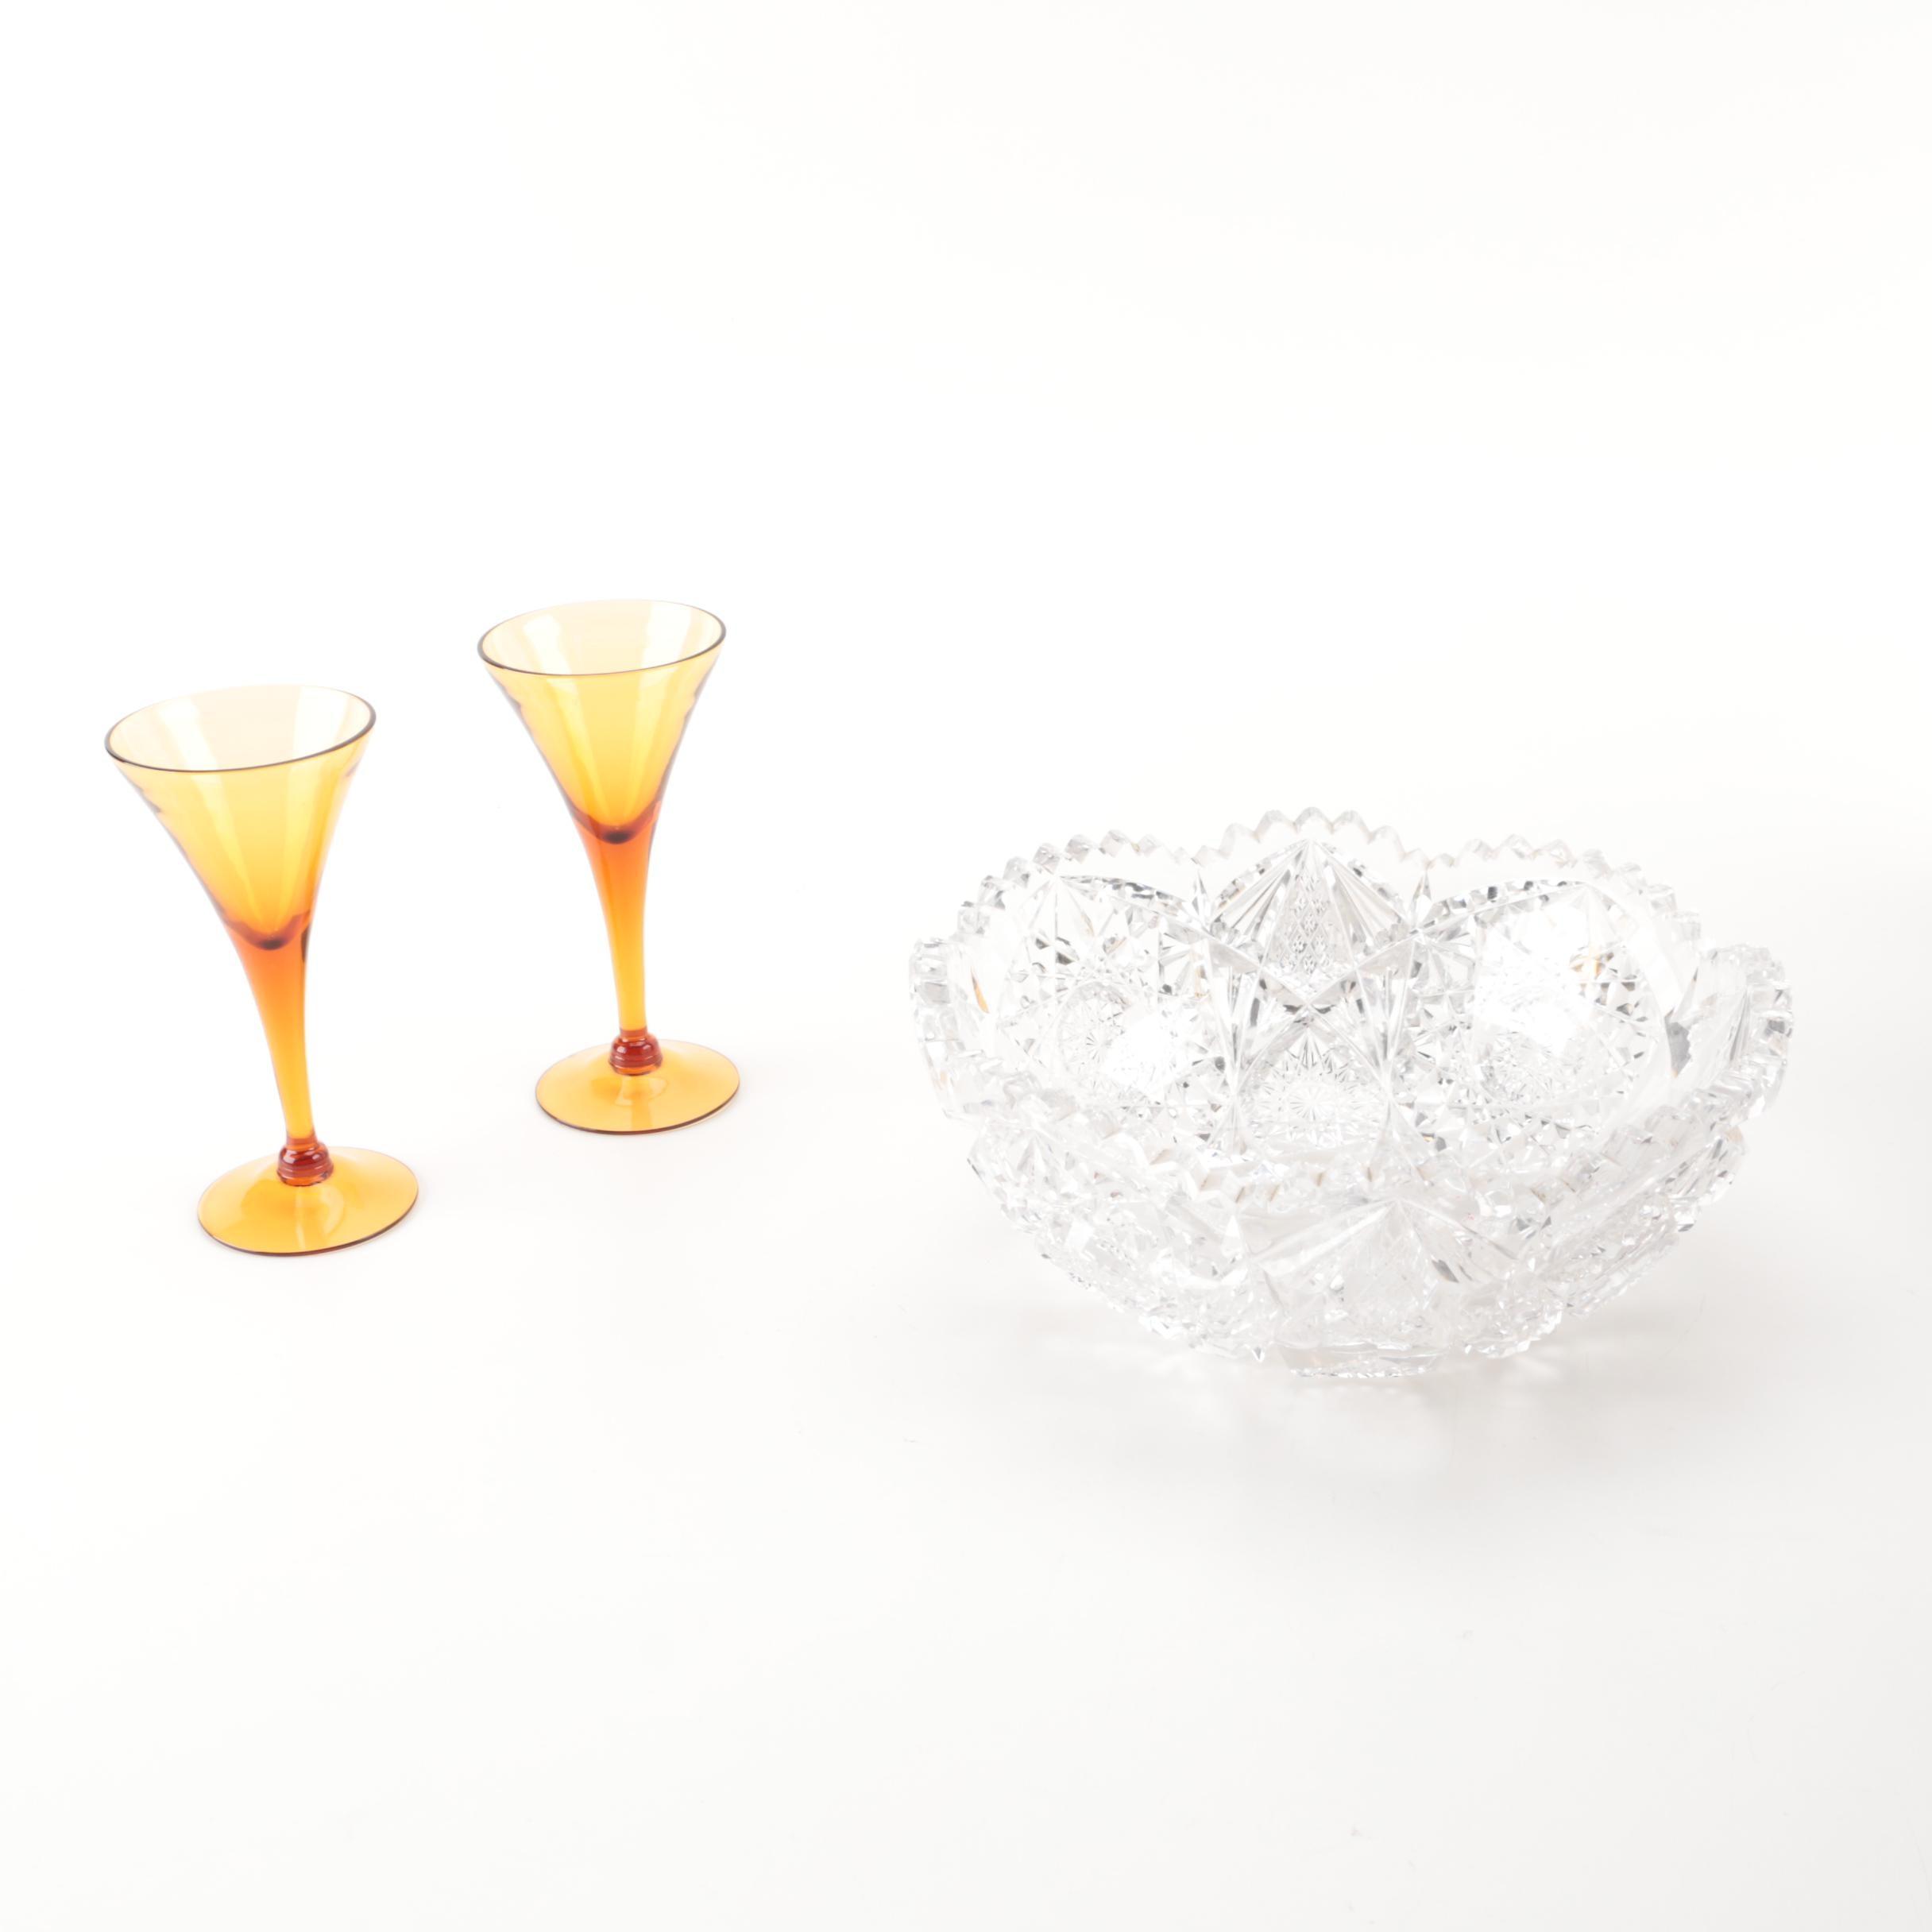 Crystal Bowl and Two Stemmed Carnival Shot Glasses